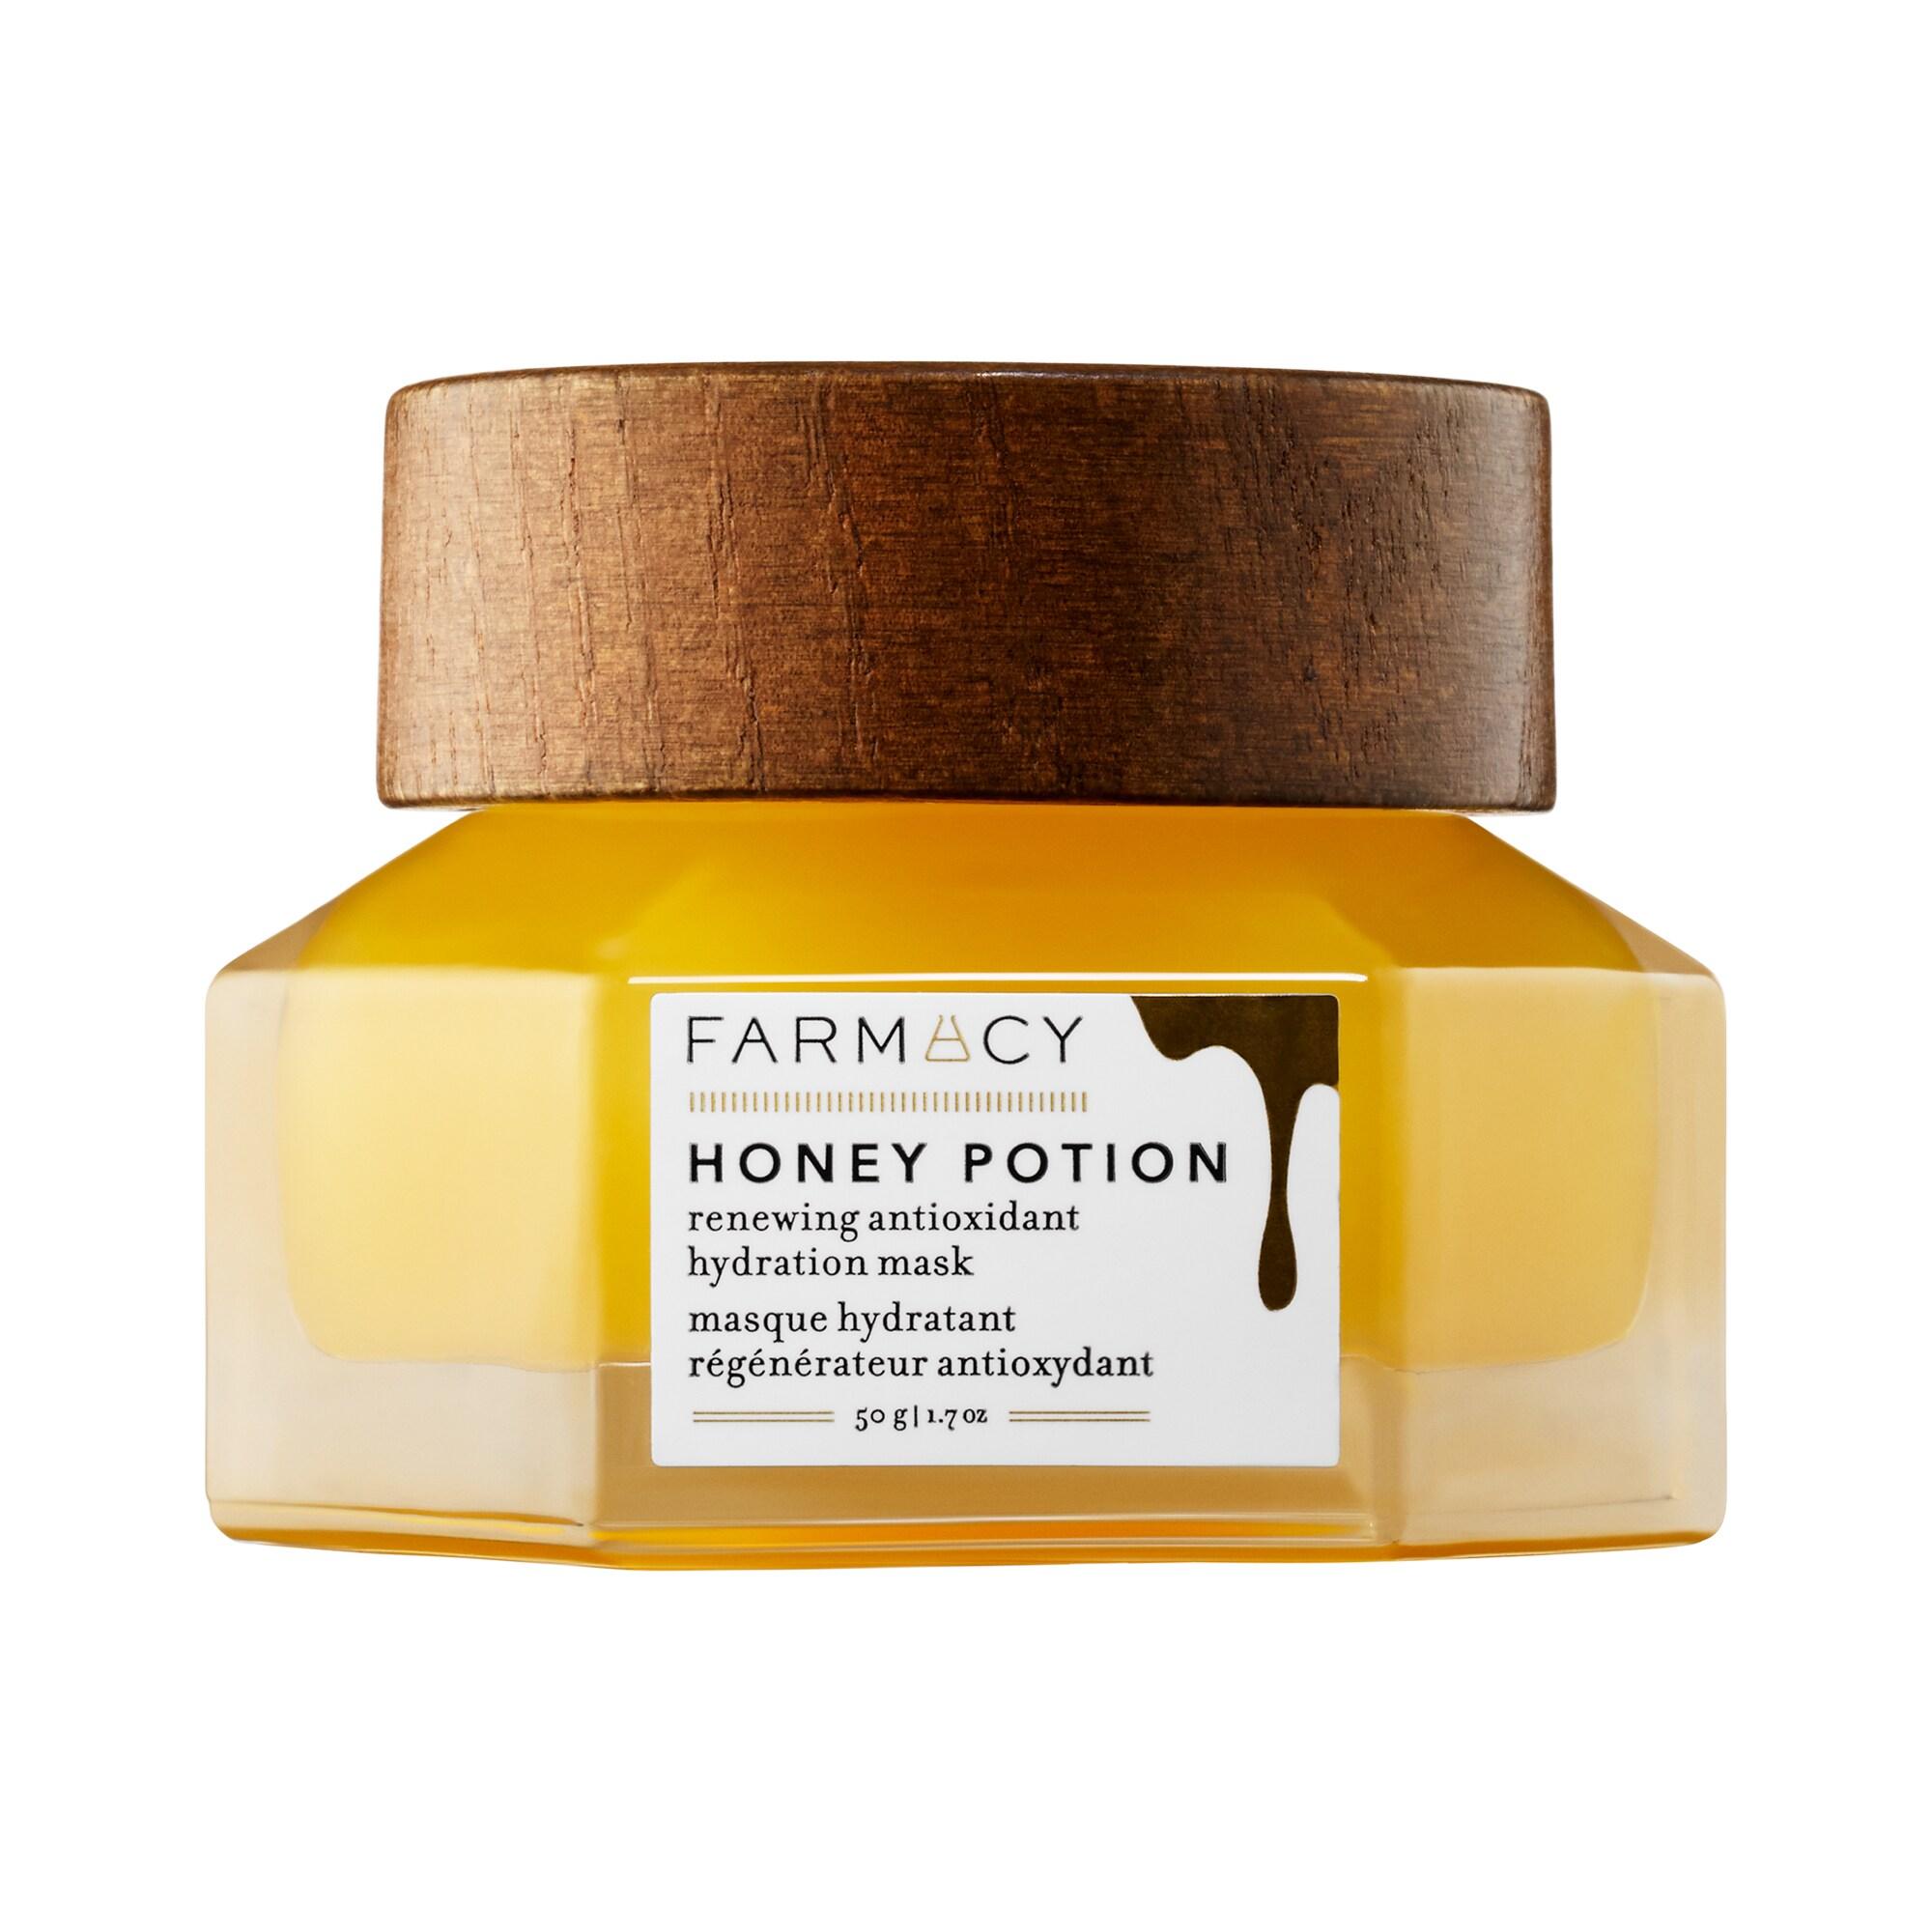 Farmacy - Honey Potion Renewing Antioxidant Hydration Mask with Echinacea GreenEnvy™